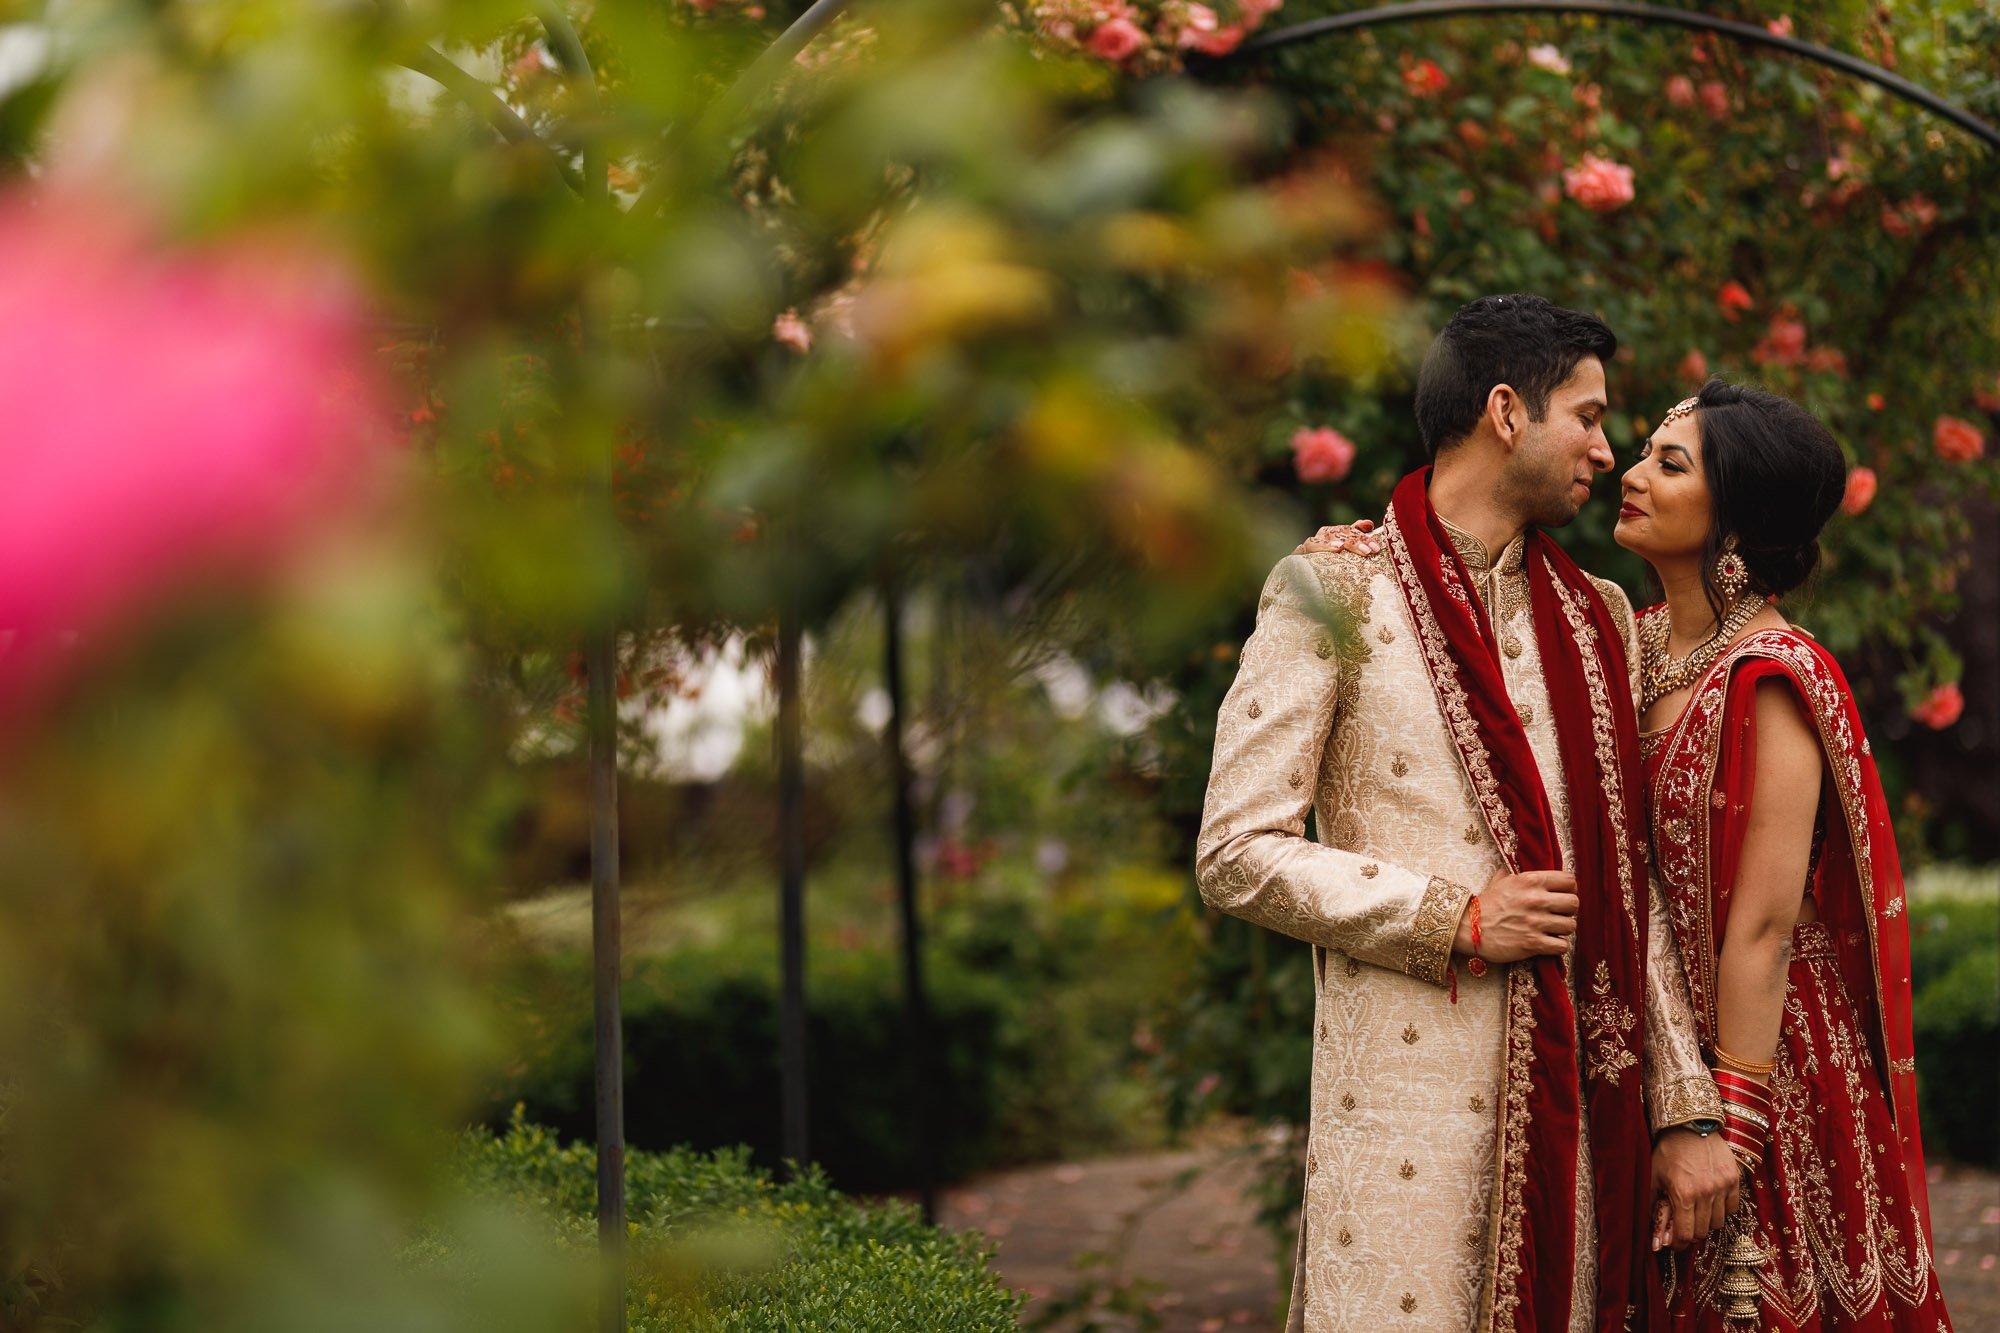 Dunchurch Park Hotel, Asian wedding photographer Midlands, bride and groom portrait